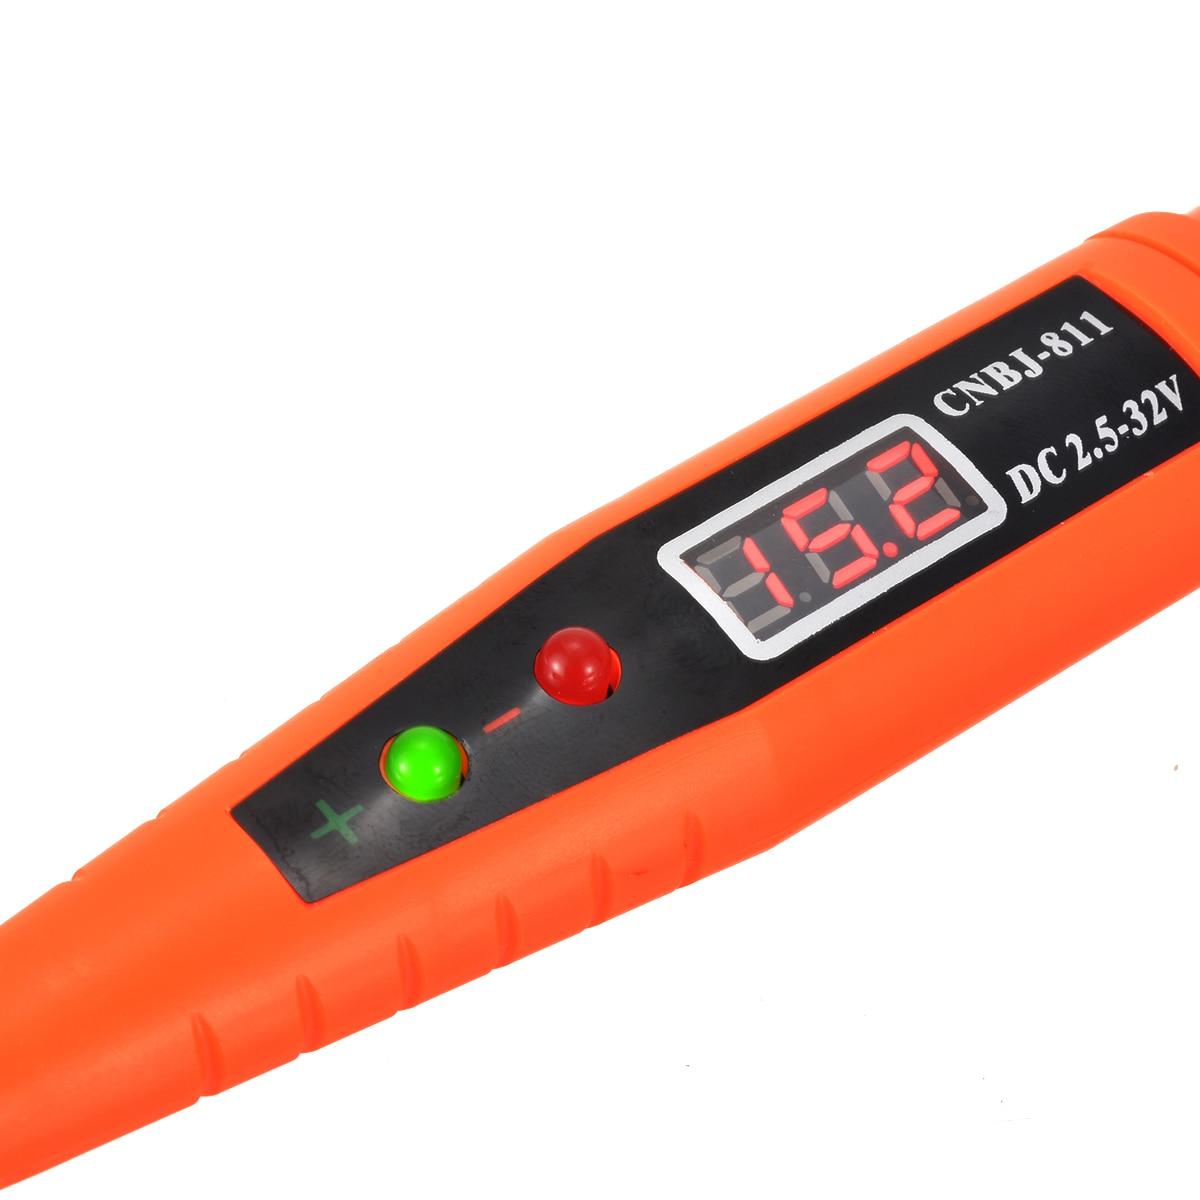 Image 5 - Digital Test Pencil Multi function Digital Display Voltage Tester Test Pen 2.5 32V For Checking Circuits Fuses